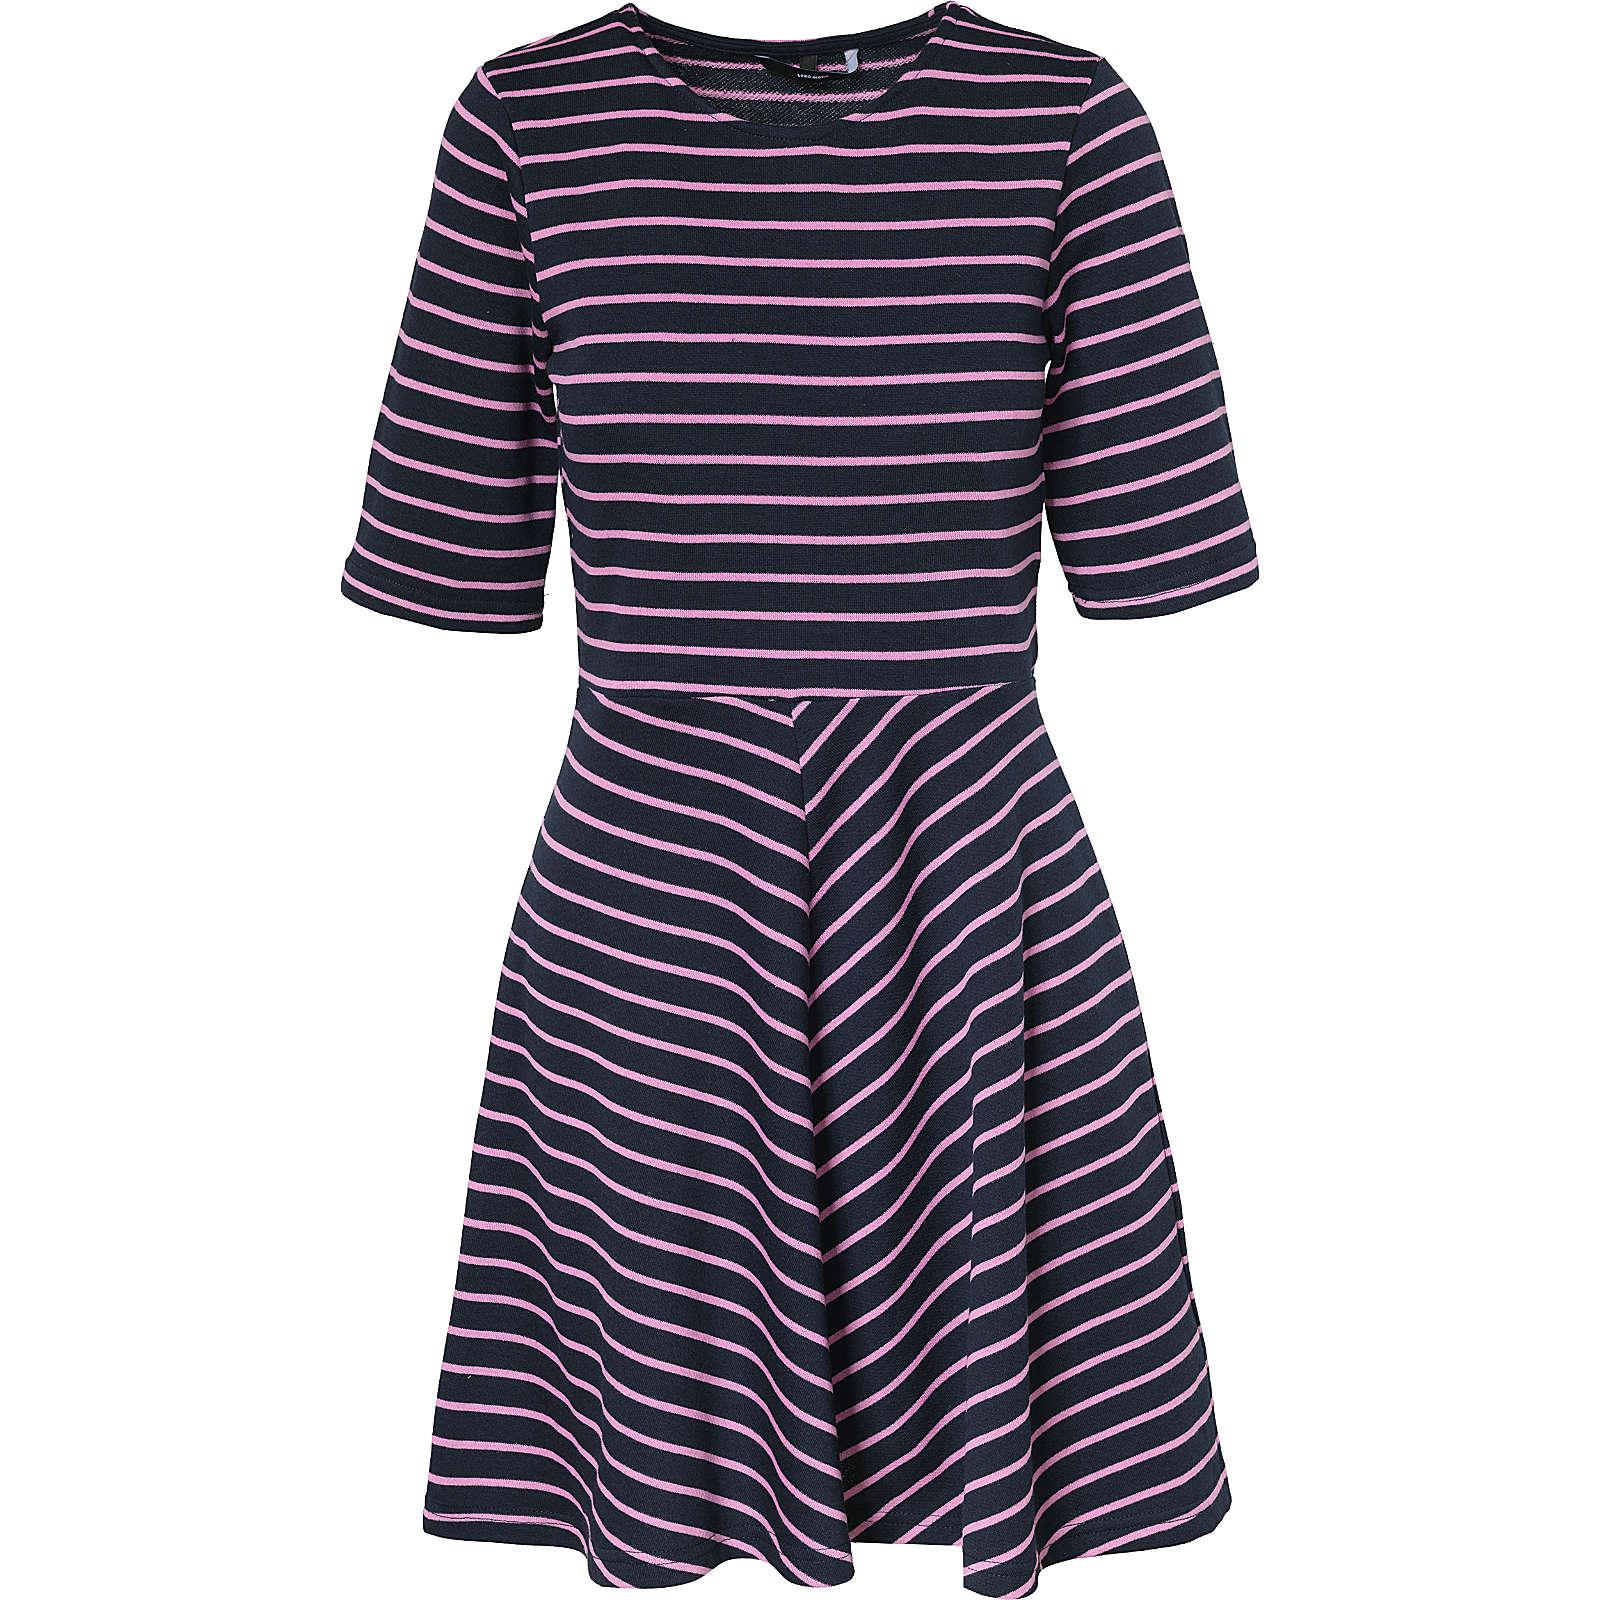 VERO MODA VMULA 2/4 SHORT DRESS A - Kleider* - weiblich pink/blau Damen Gr. 36